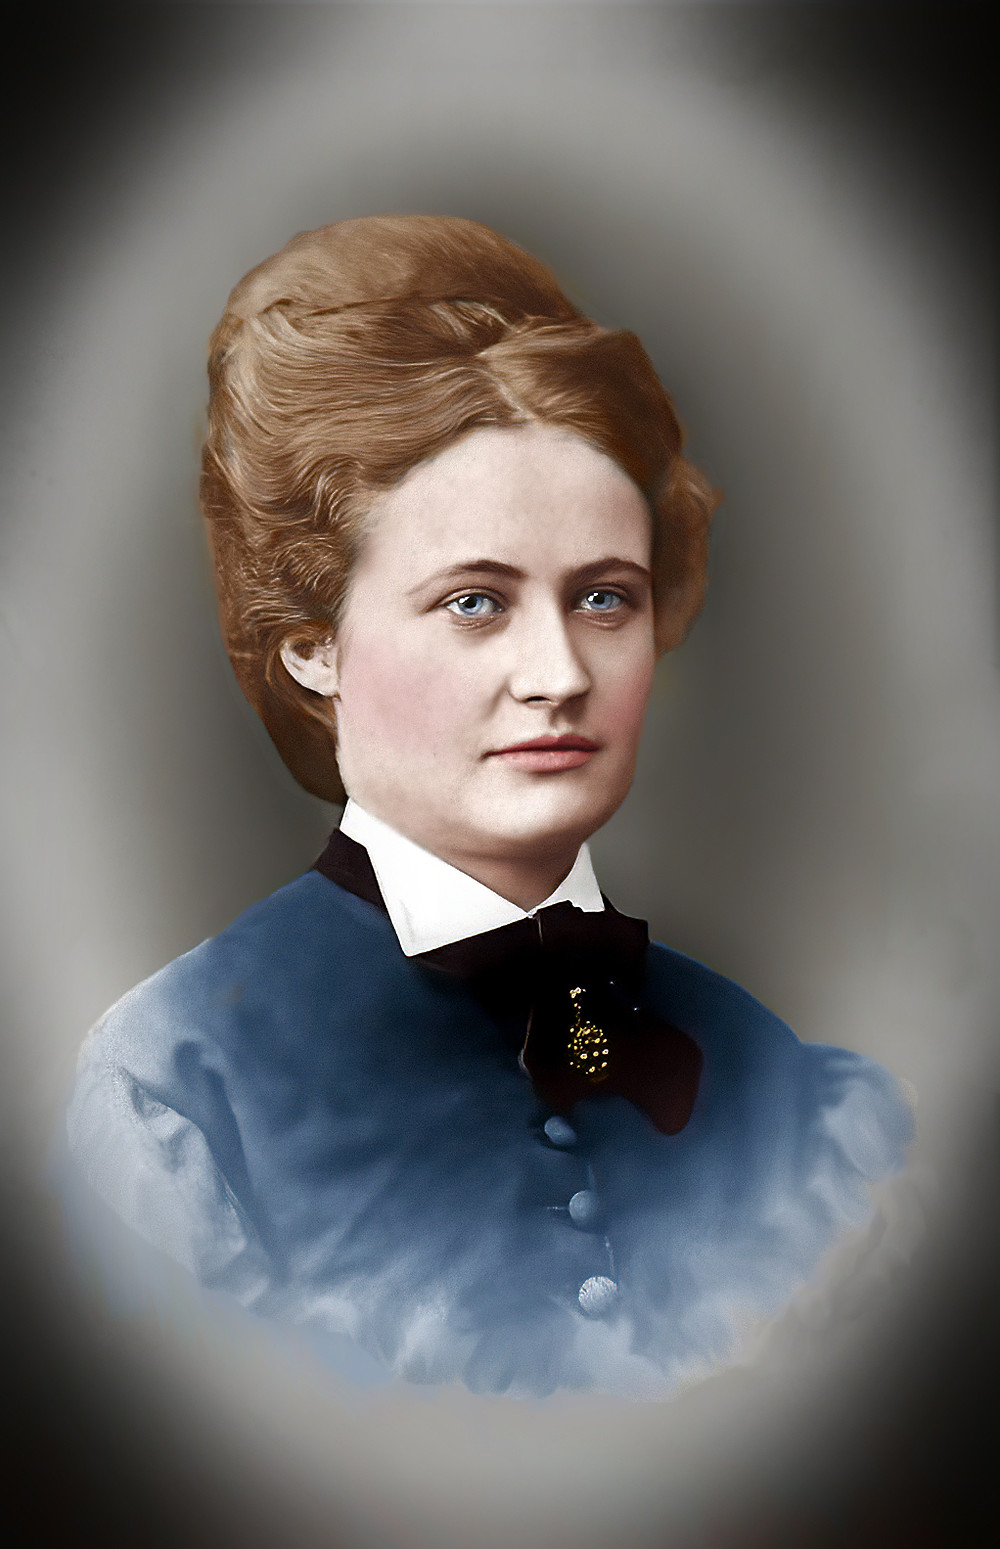 Anna Maria Carolina Sandström, Colorization by Claudia D'Souza - The Photo Alchemist